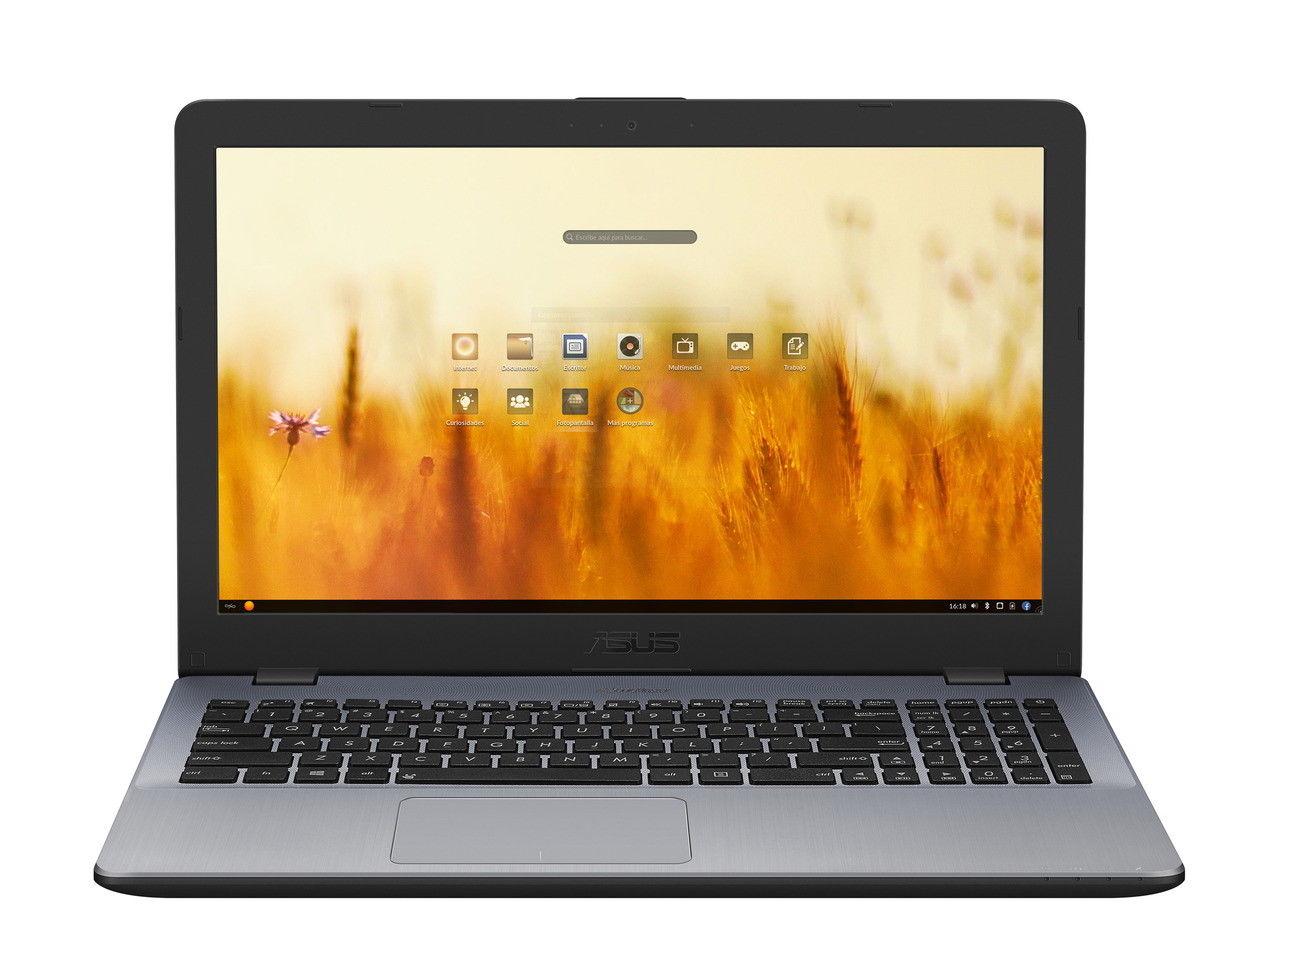 [329€] ASUS i3-8130U/4GB RAM/256GB SSD POCAS UNIDADES